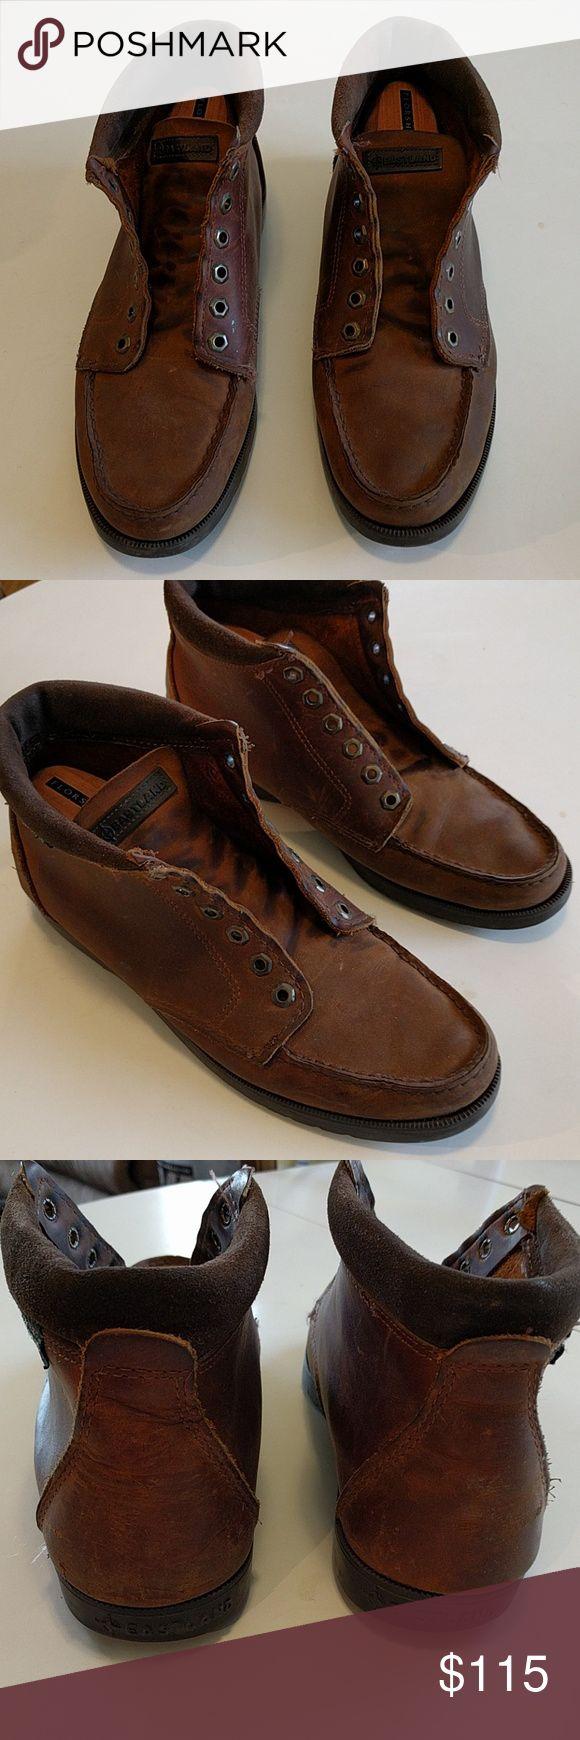 Eastland ankle boots Vintage 6-eyelet made in USA Eastland boots Eastland Shoes Boots